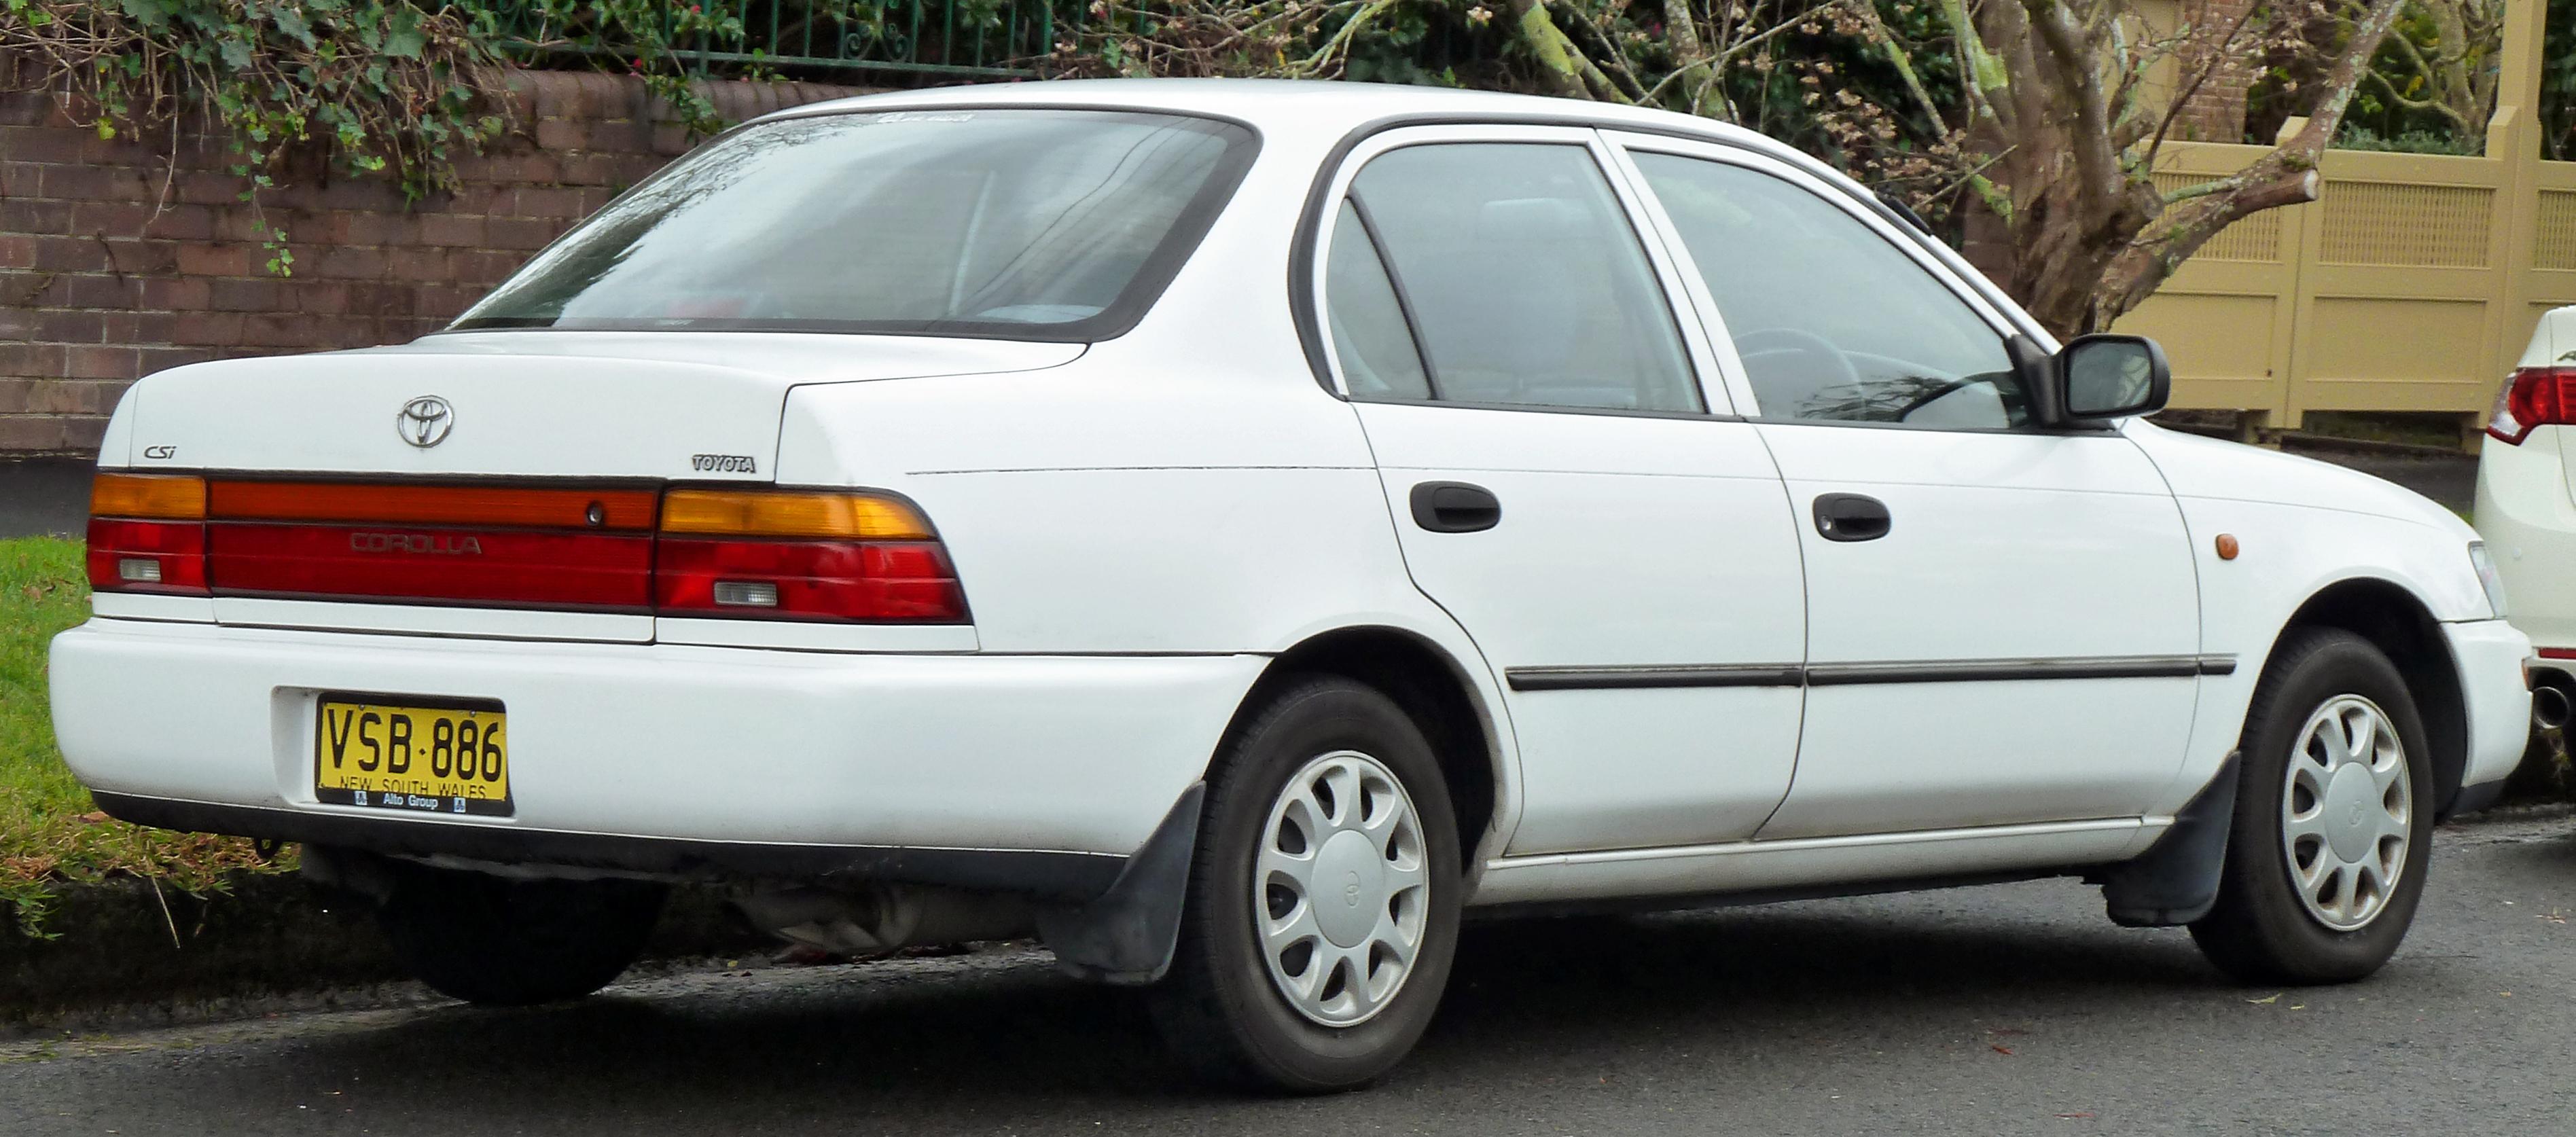 Car Diagram Of A Toyota Corlla